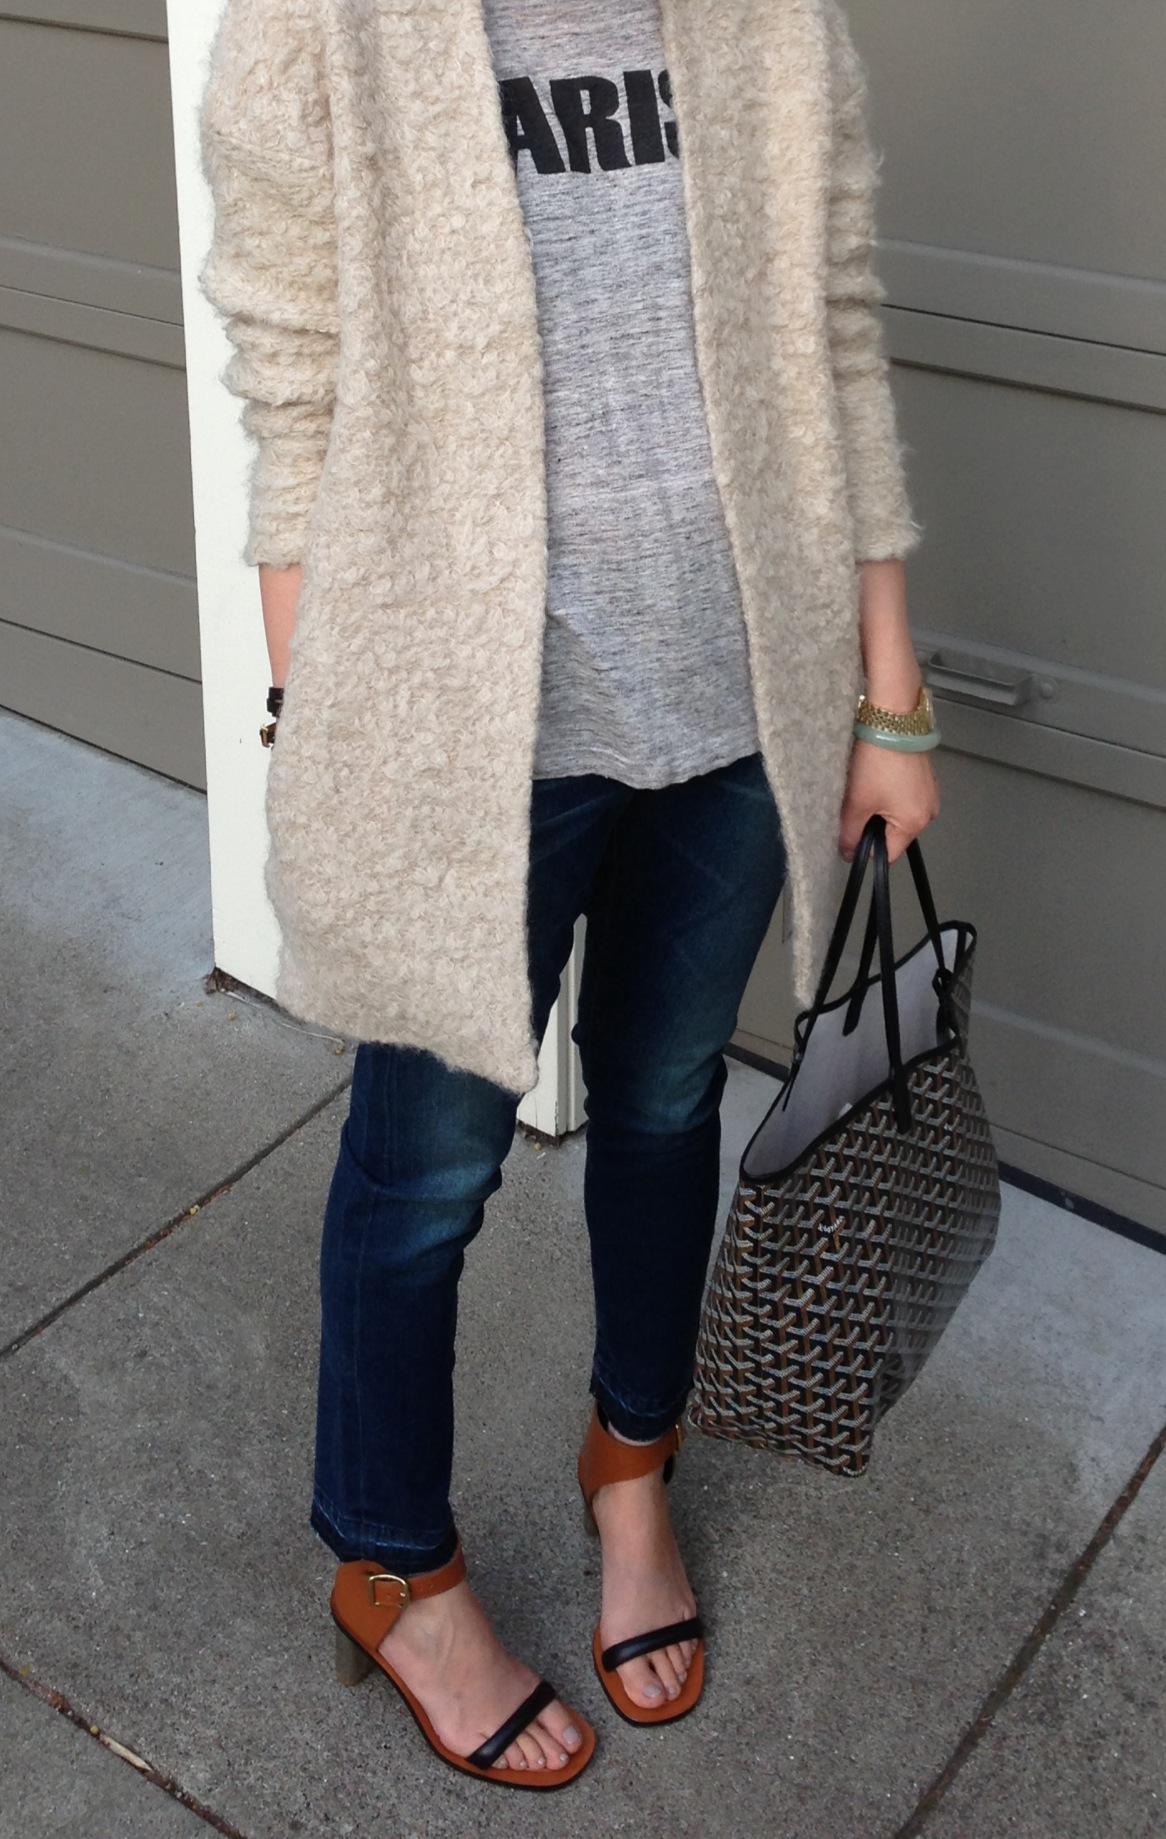 81517d77 Fuzzy jacket by H&M Trend Goyard bag and Celine shoes neutrals